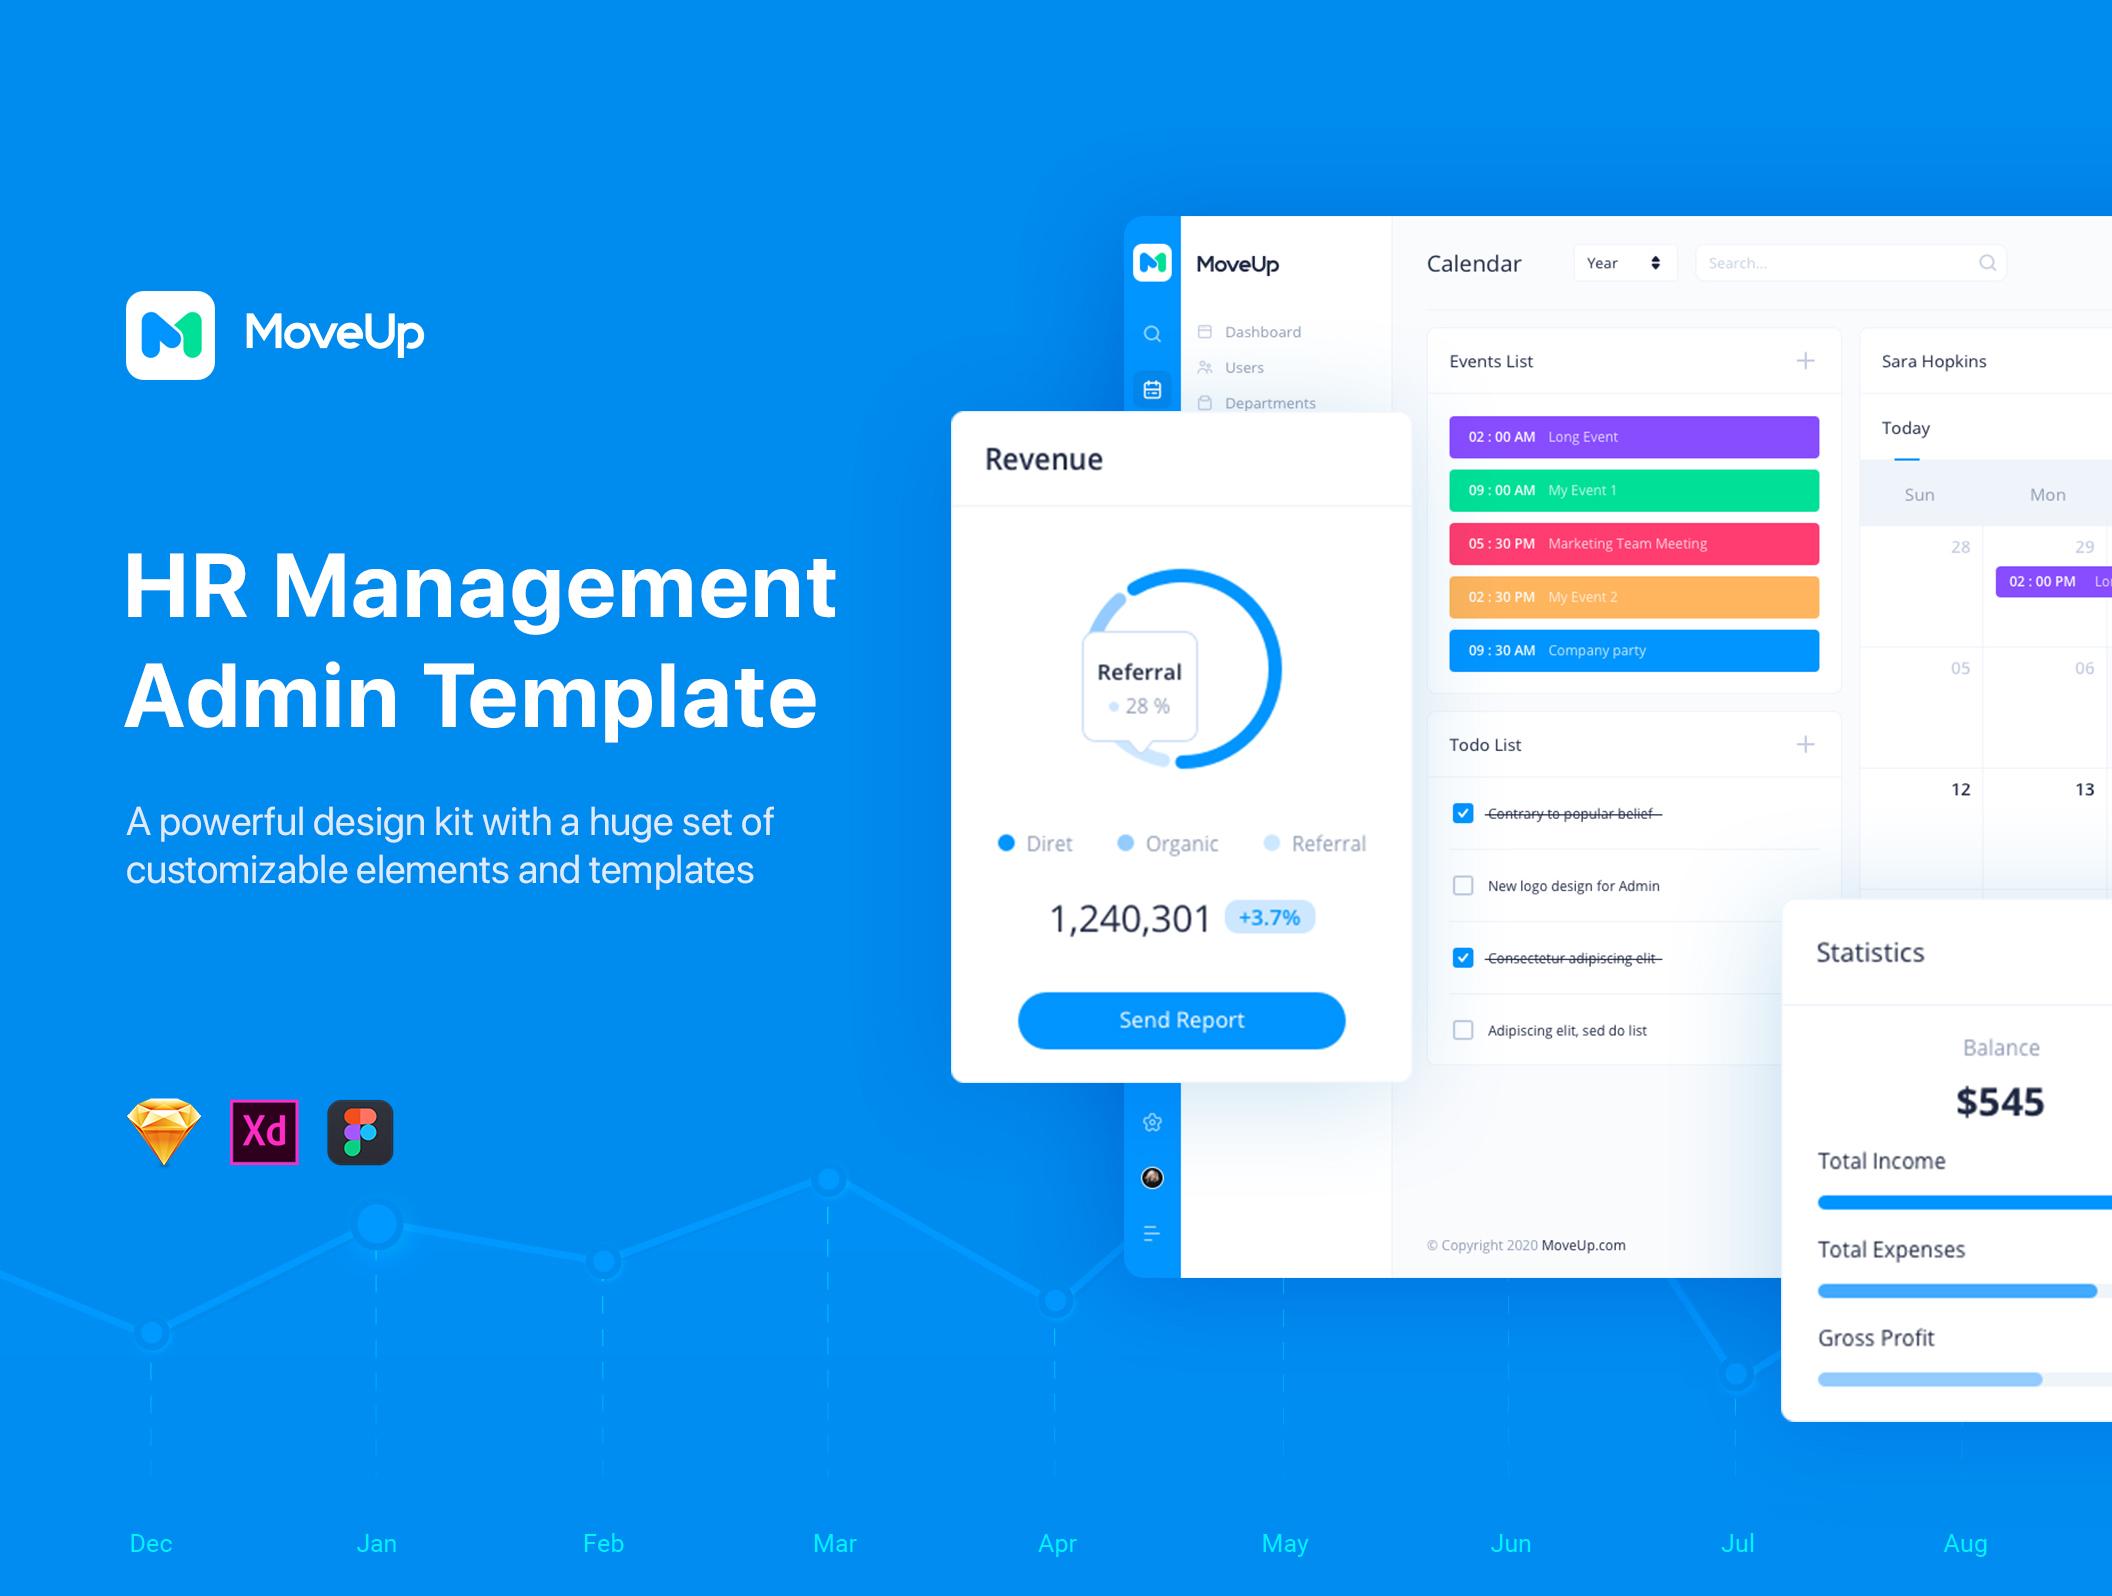 MoveUp - HR Management Admin Template